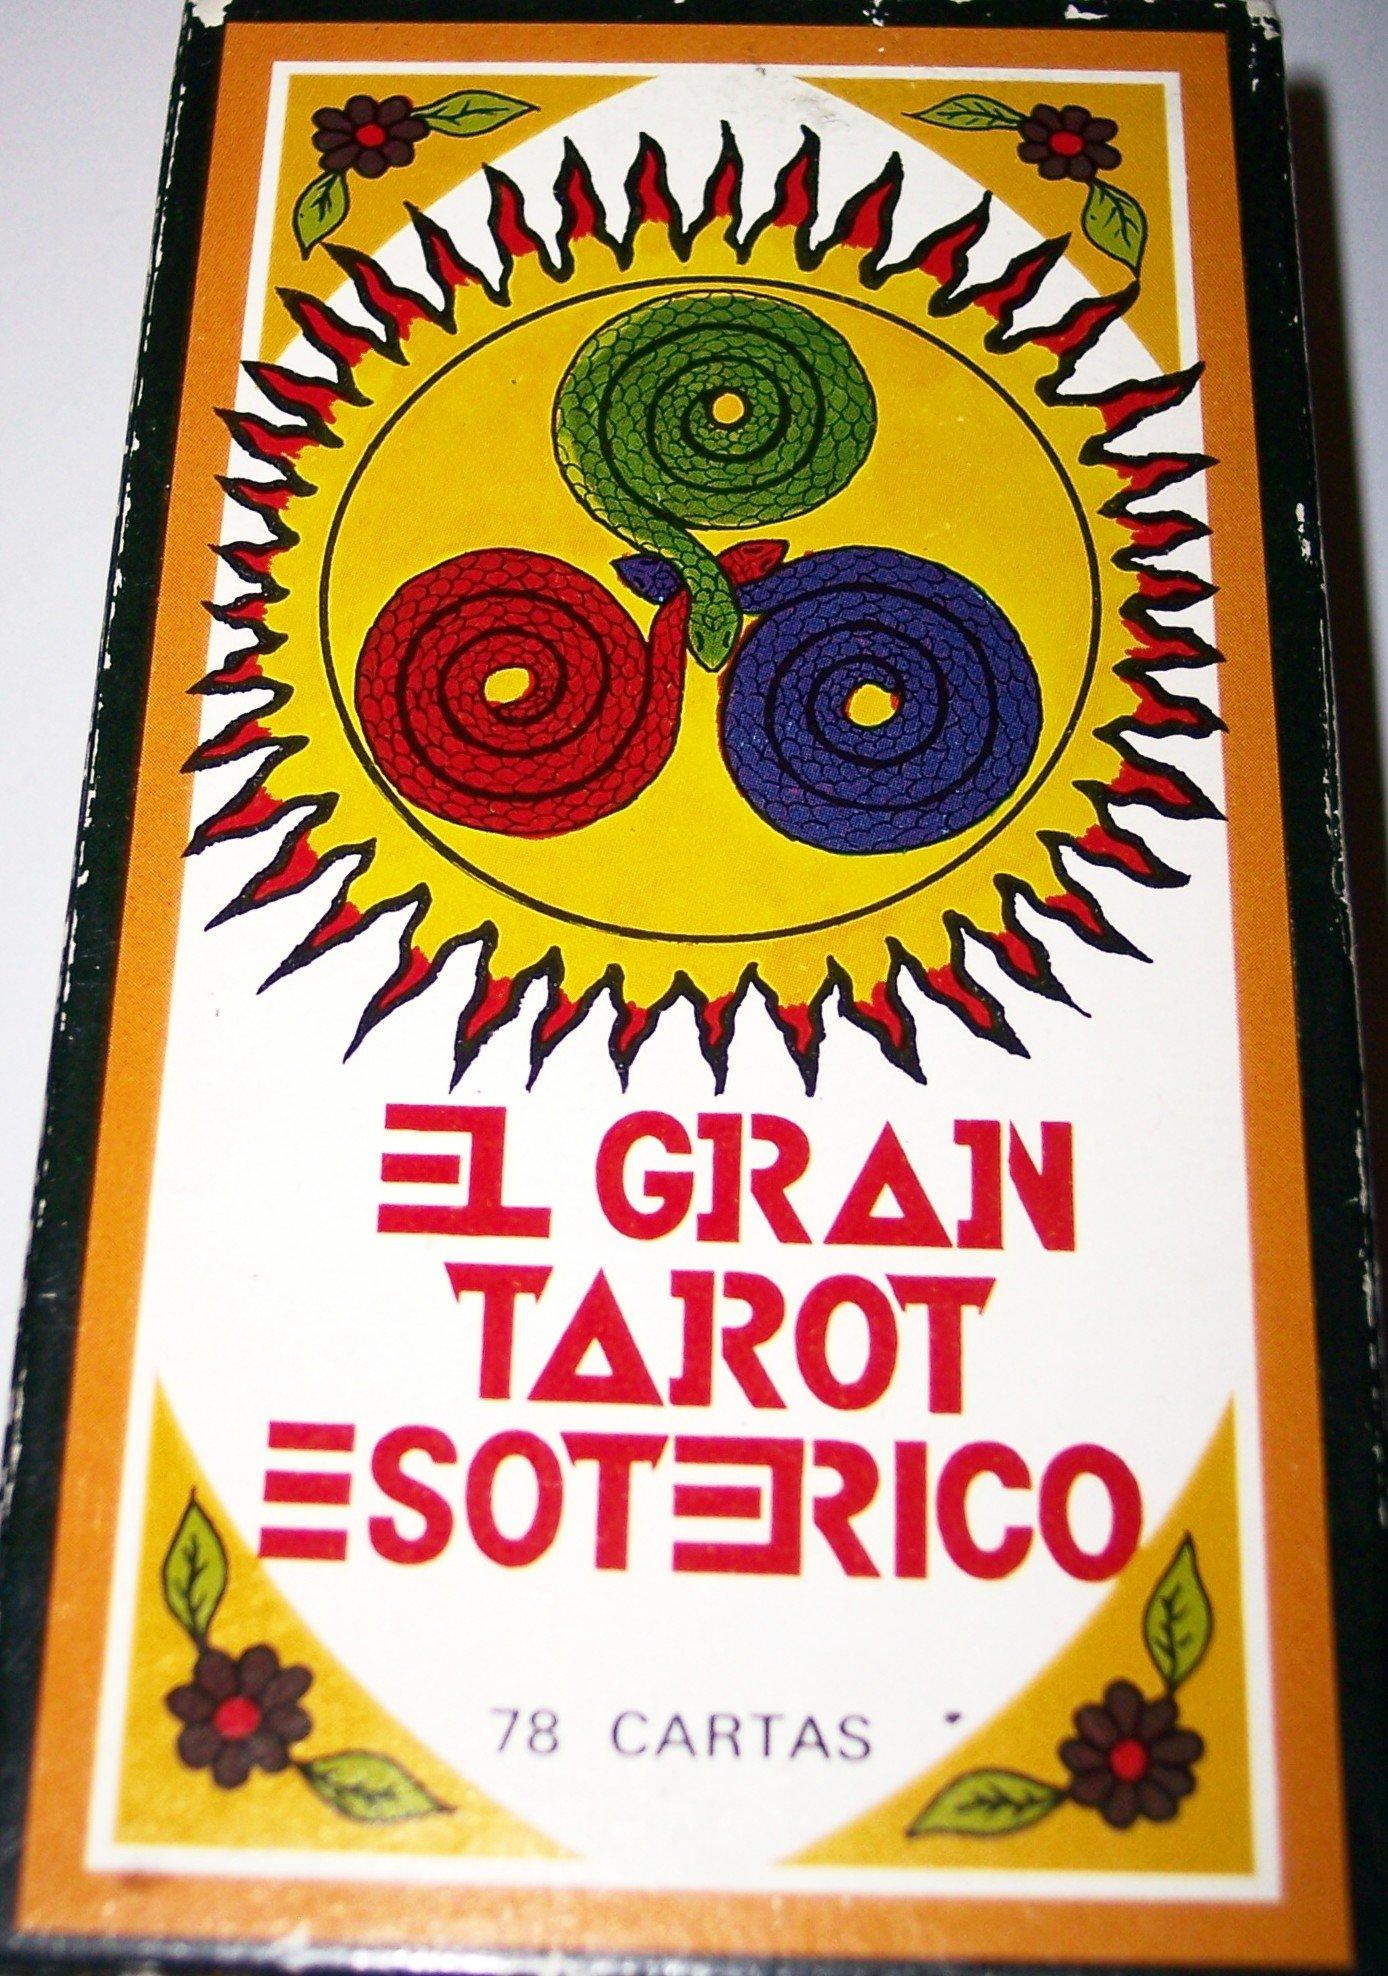 El Gran Tarot Esoterico Deck: The Great Esoteric Tarot ...